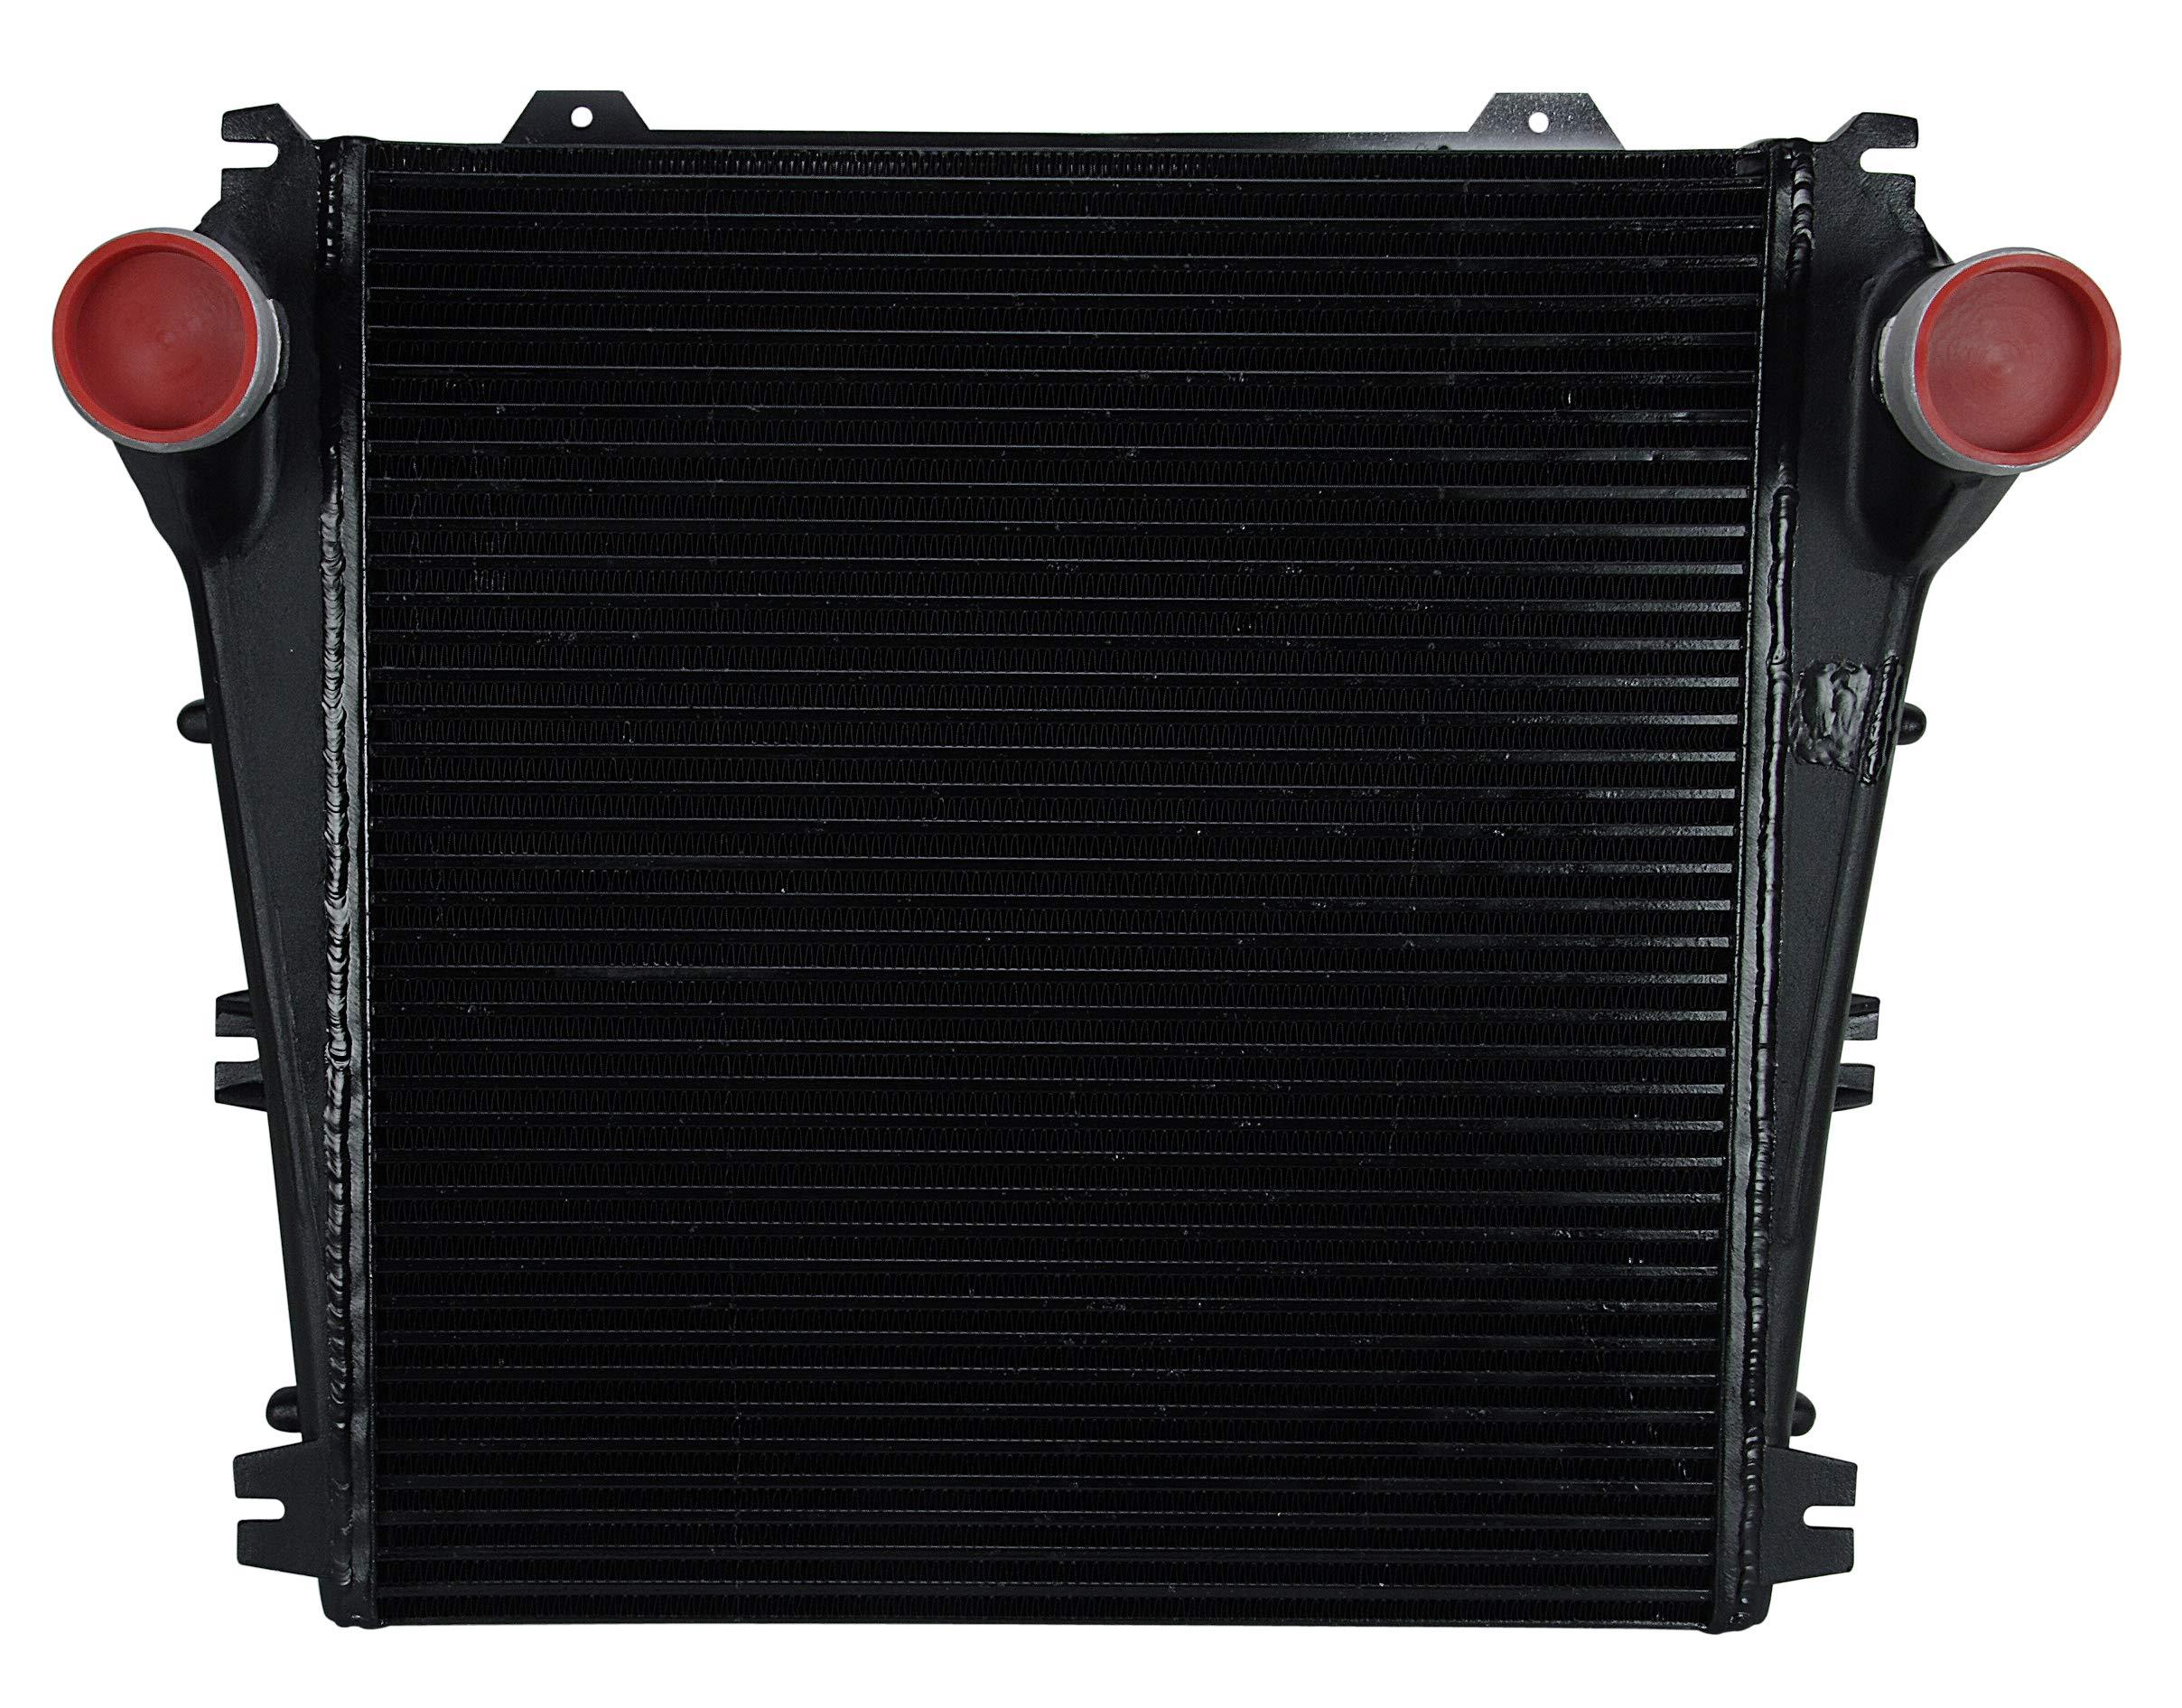 Spectra Premium 4401-1714 Turbocharger Intercooler